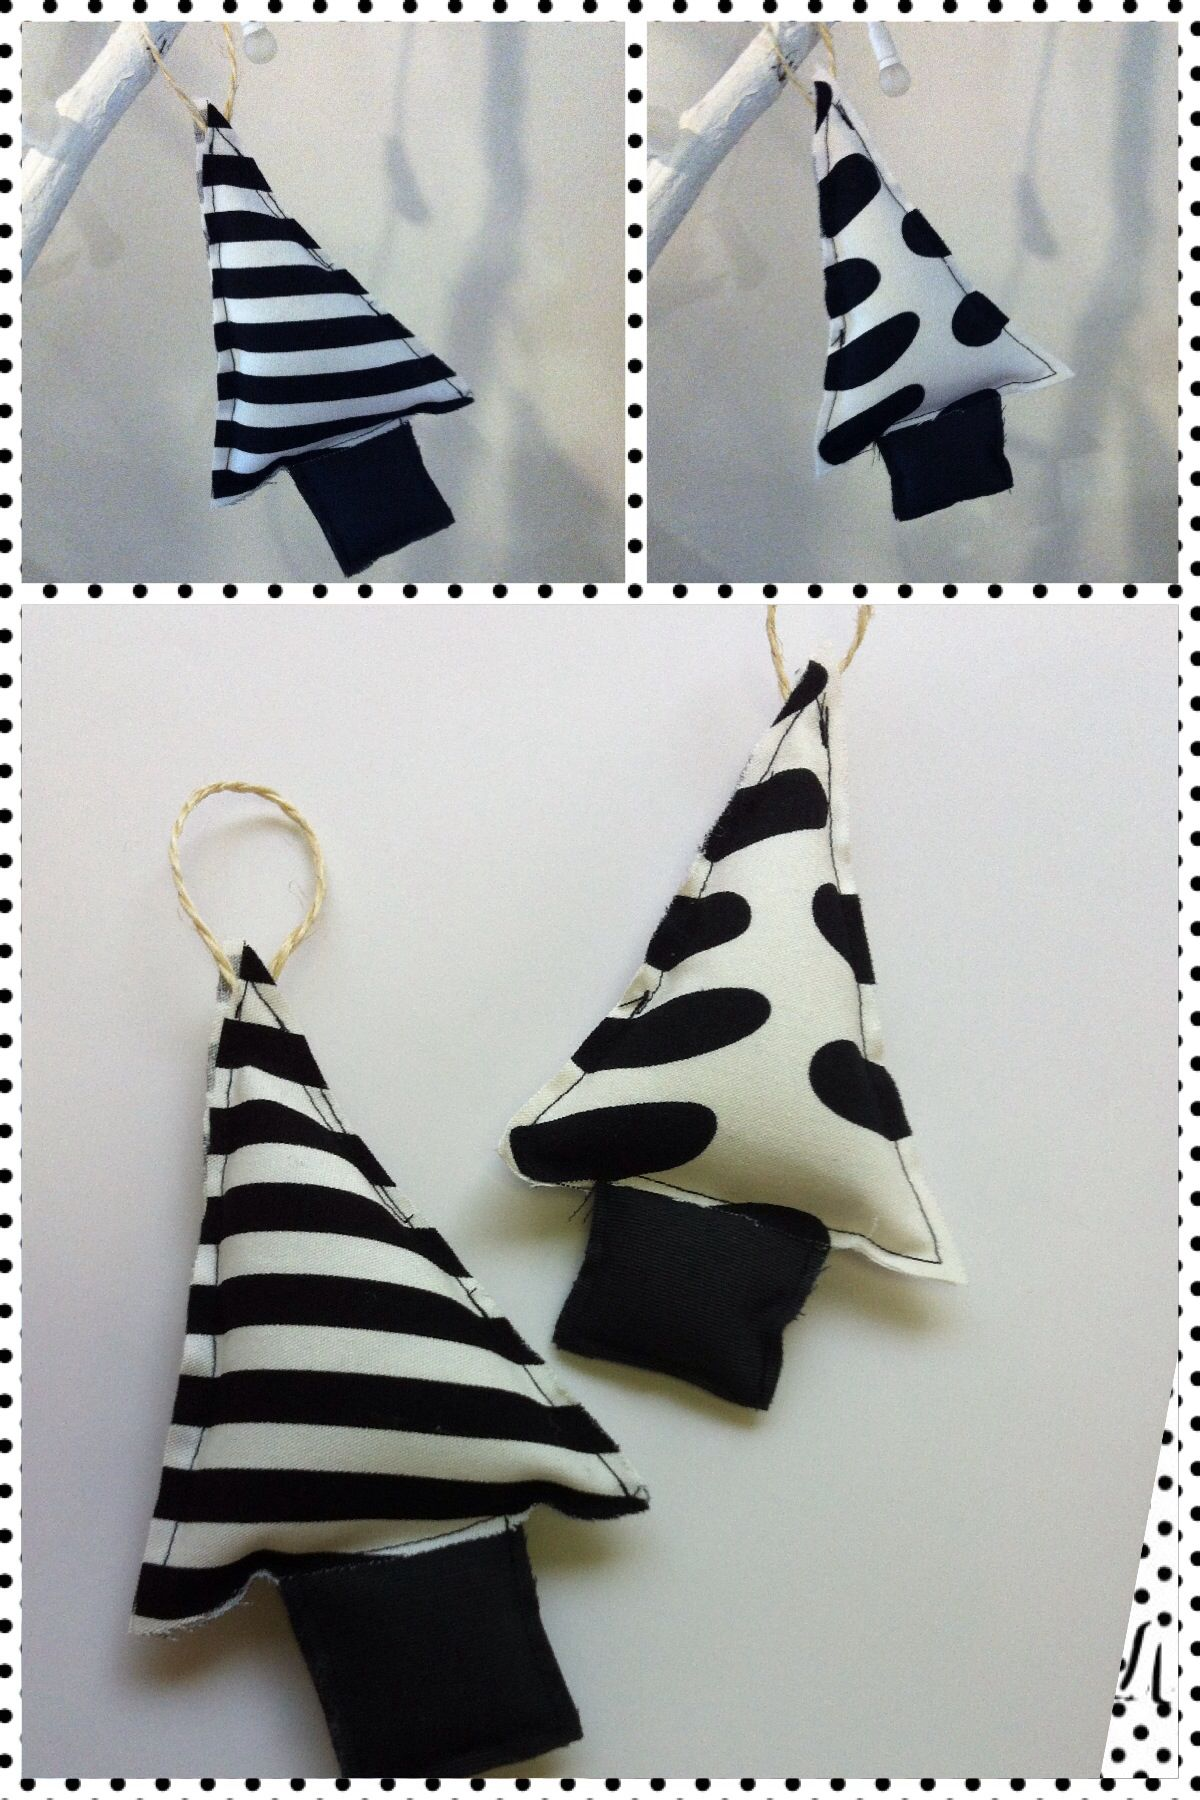 xmastree handmade by creart pameijer